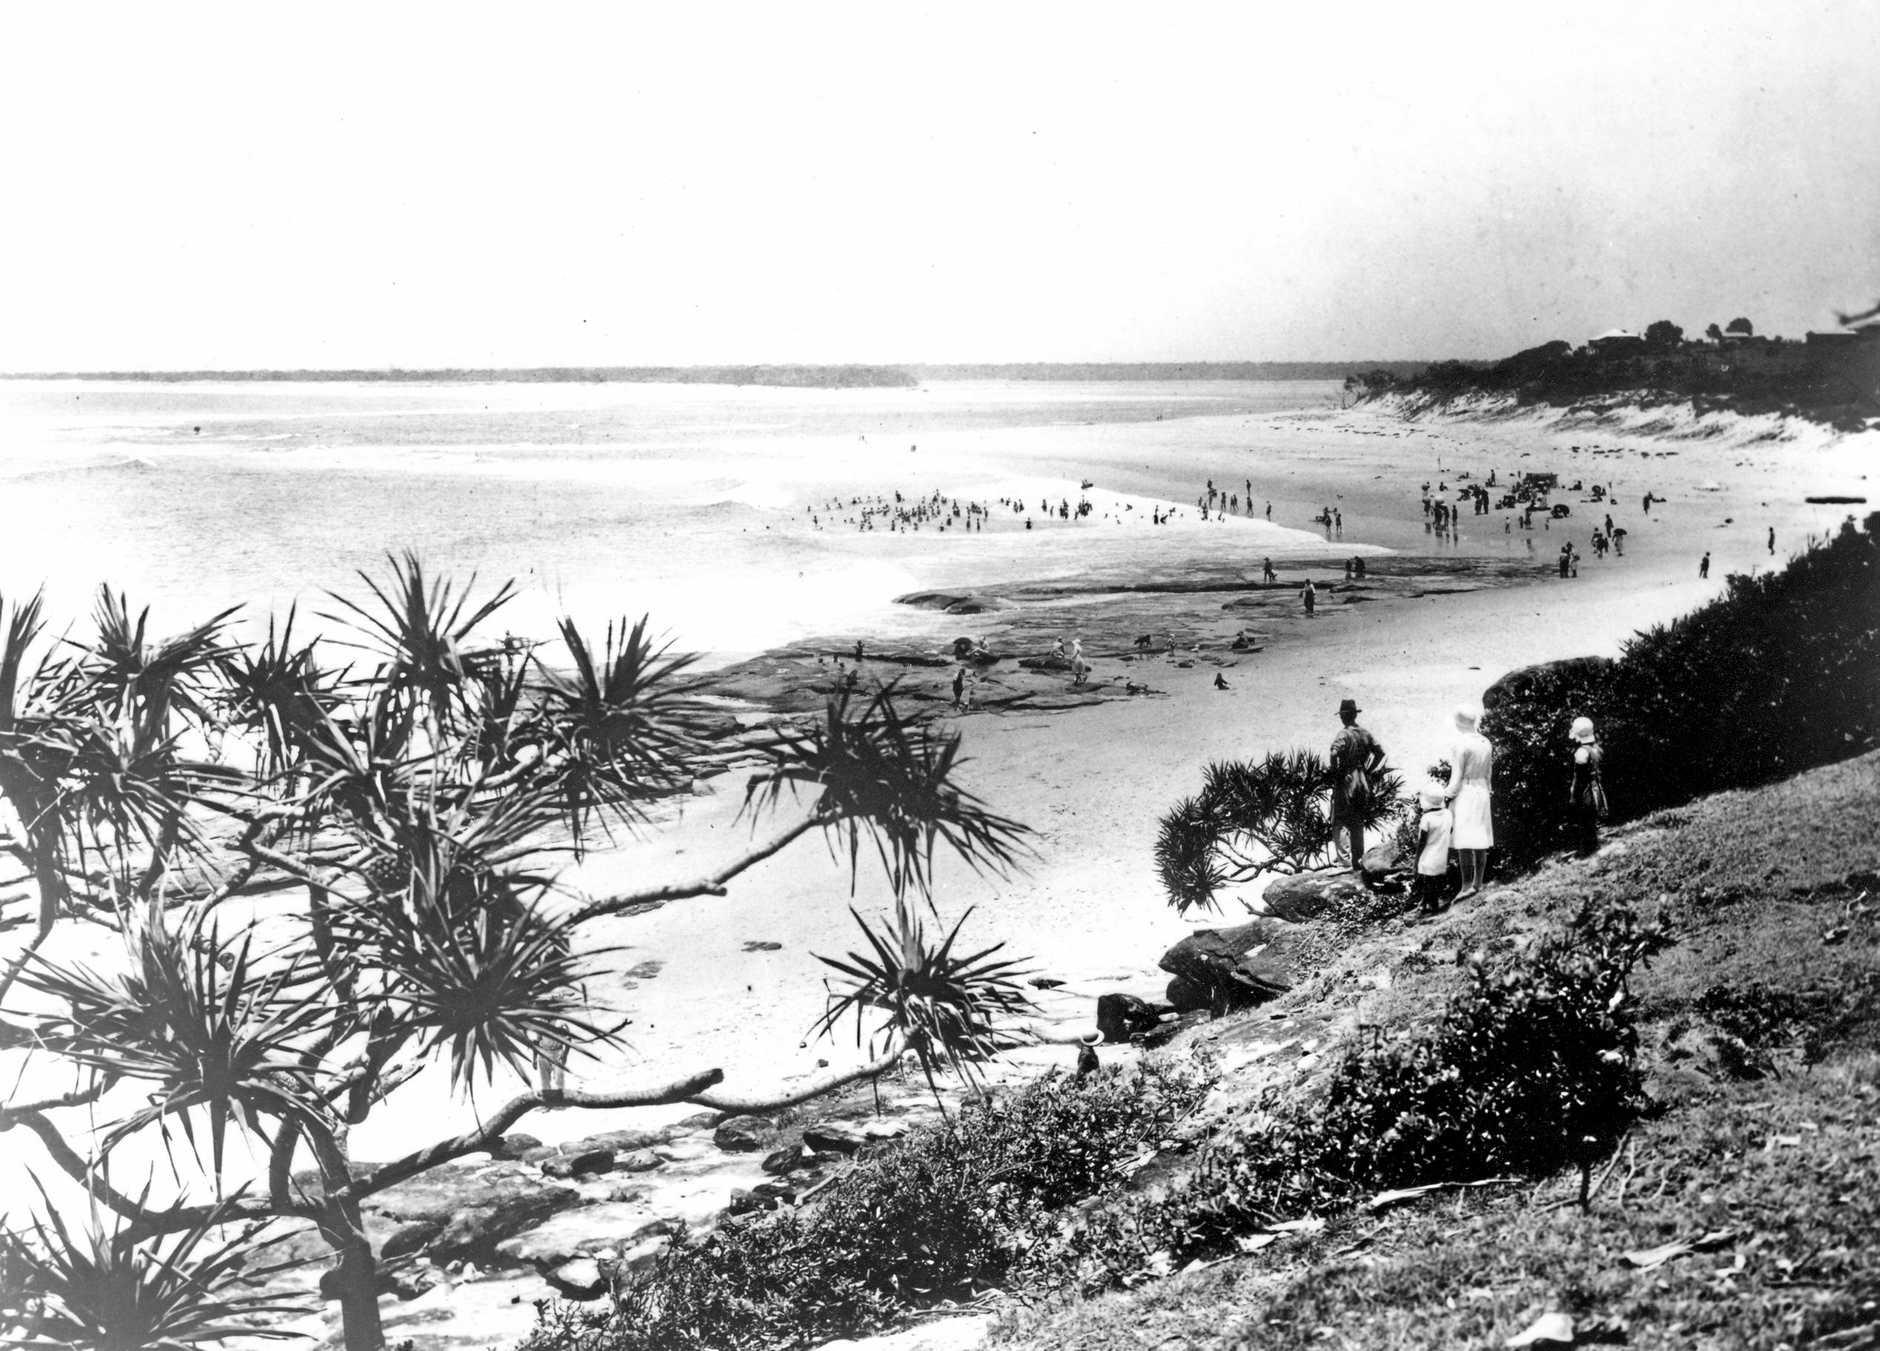 The view of Kings Beach, Caloundra, ca 1920.